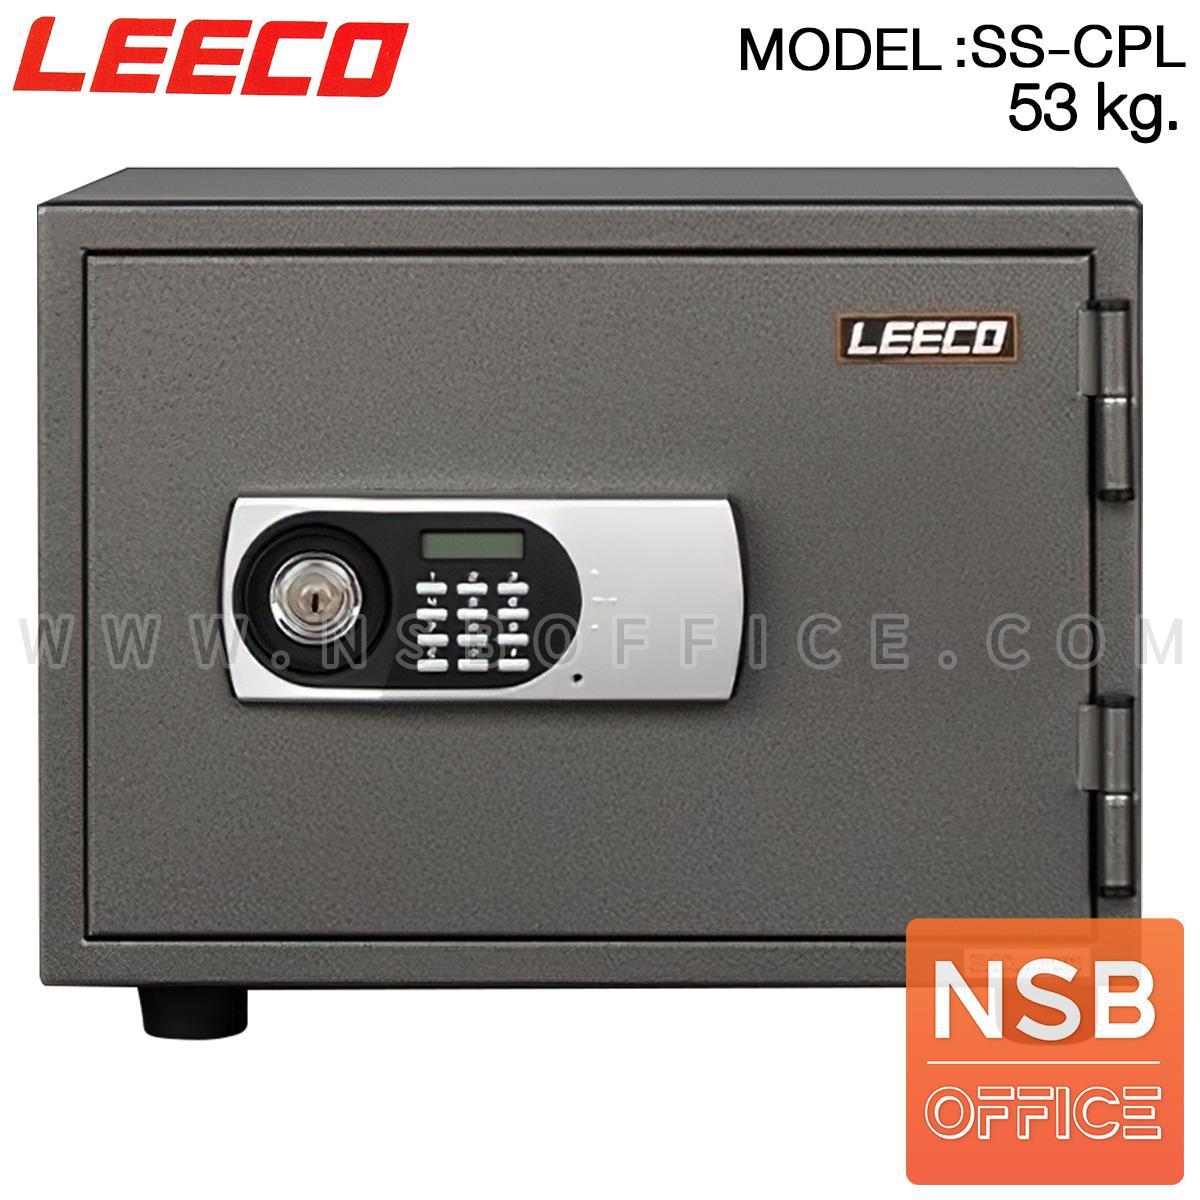 F02A059:ตู้เซฟดิจิตอล 53 กก. ลีโก้ รุ่น SS-CPL  1 กุญแจ 1 รหัส